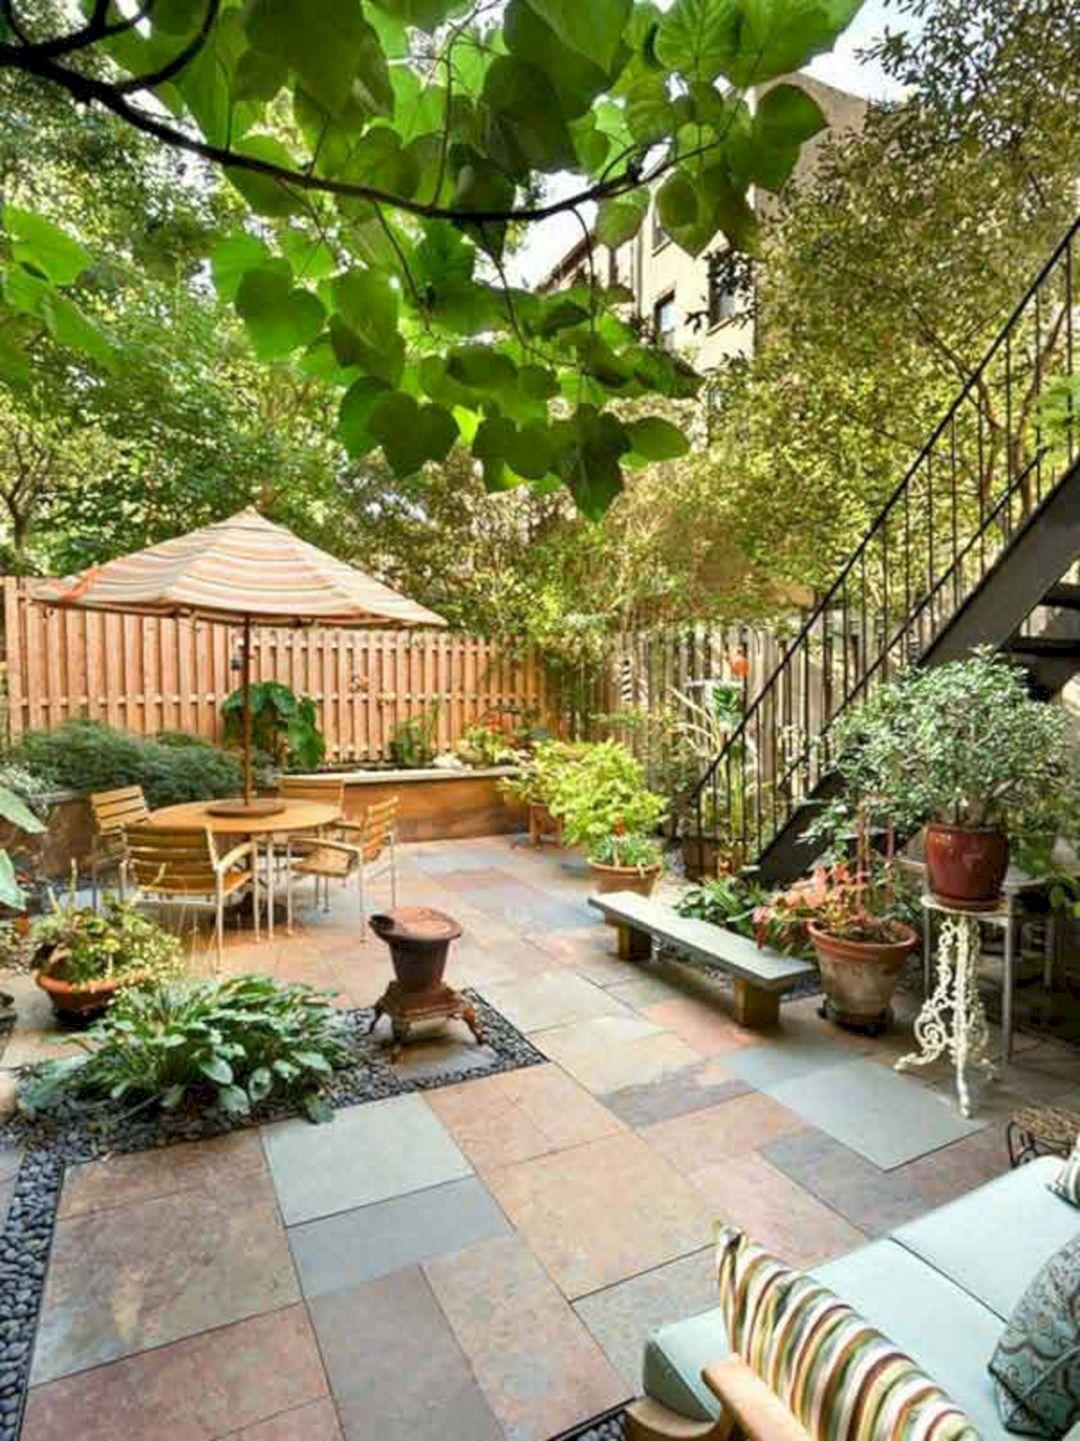 Small backyard patio landscaping ideas small backyard for Small backyard renovations